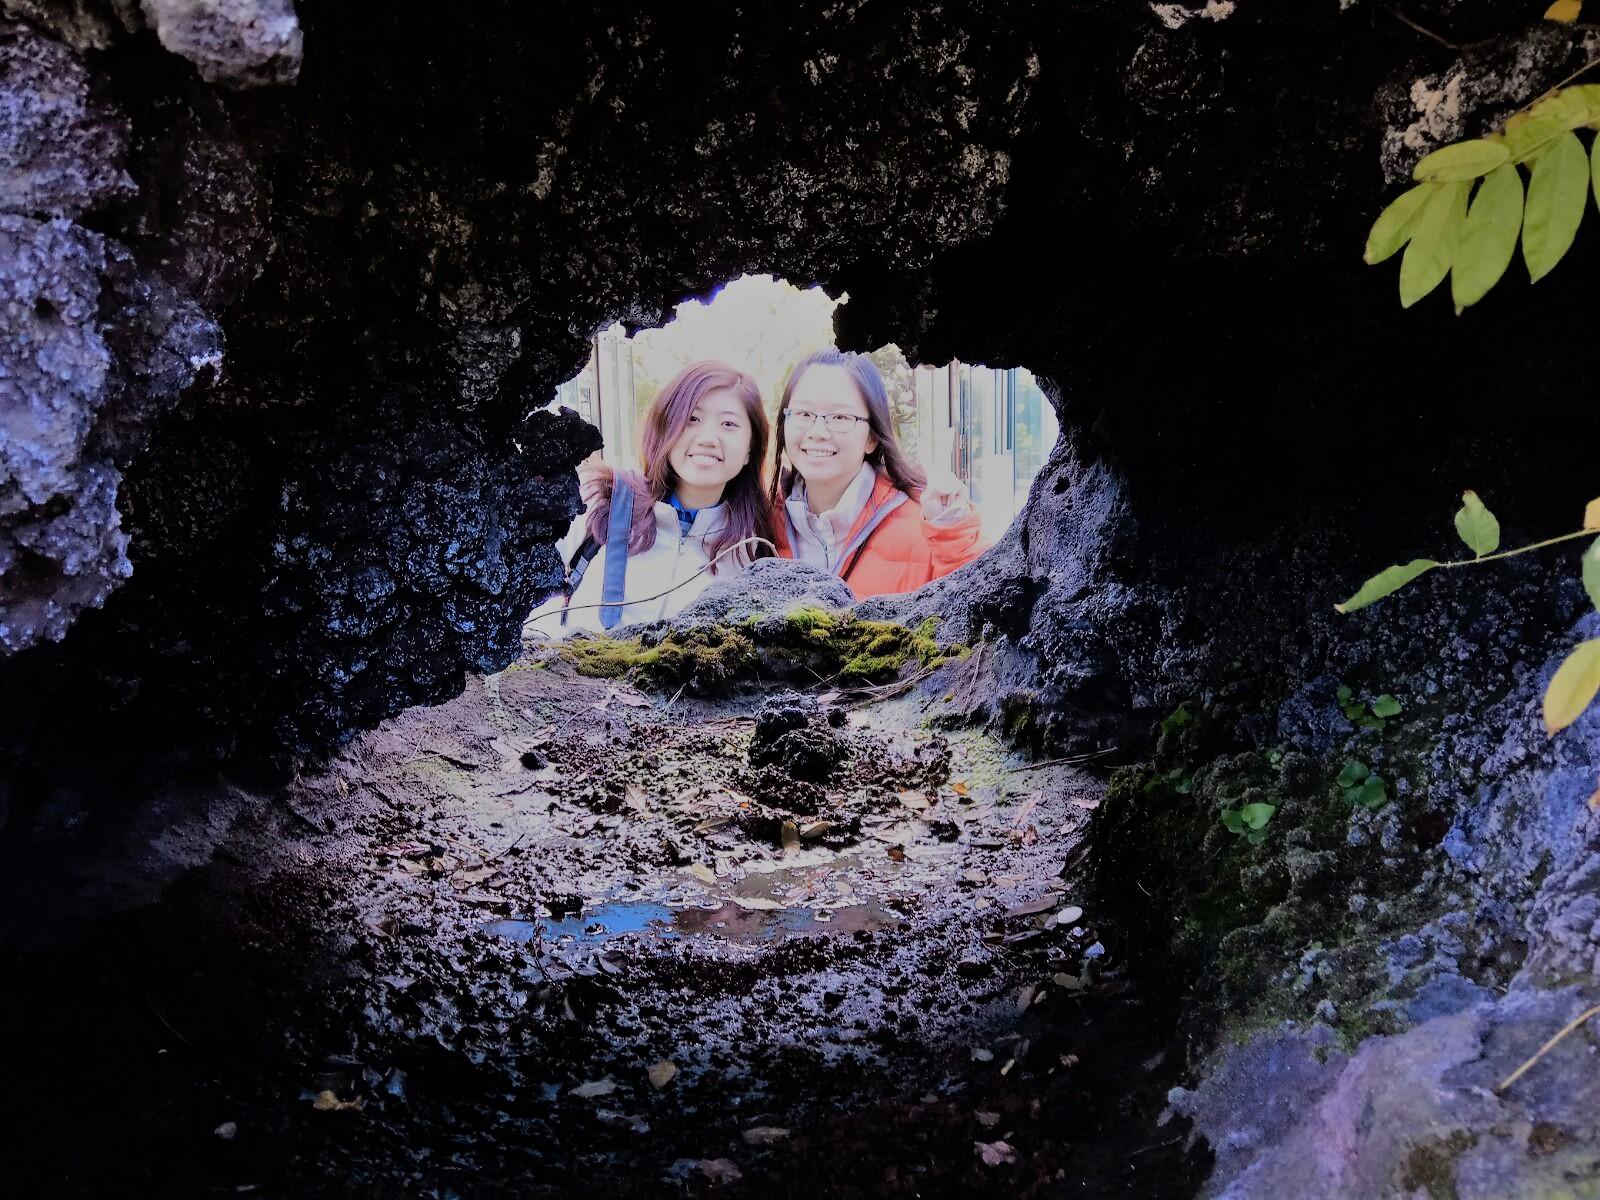 jeju tour guide ko bang yong